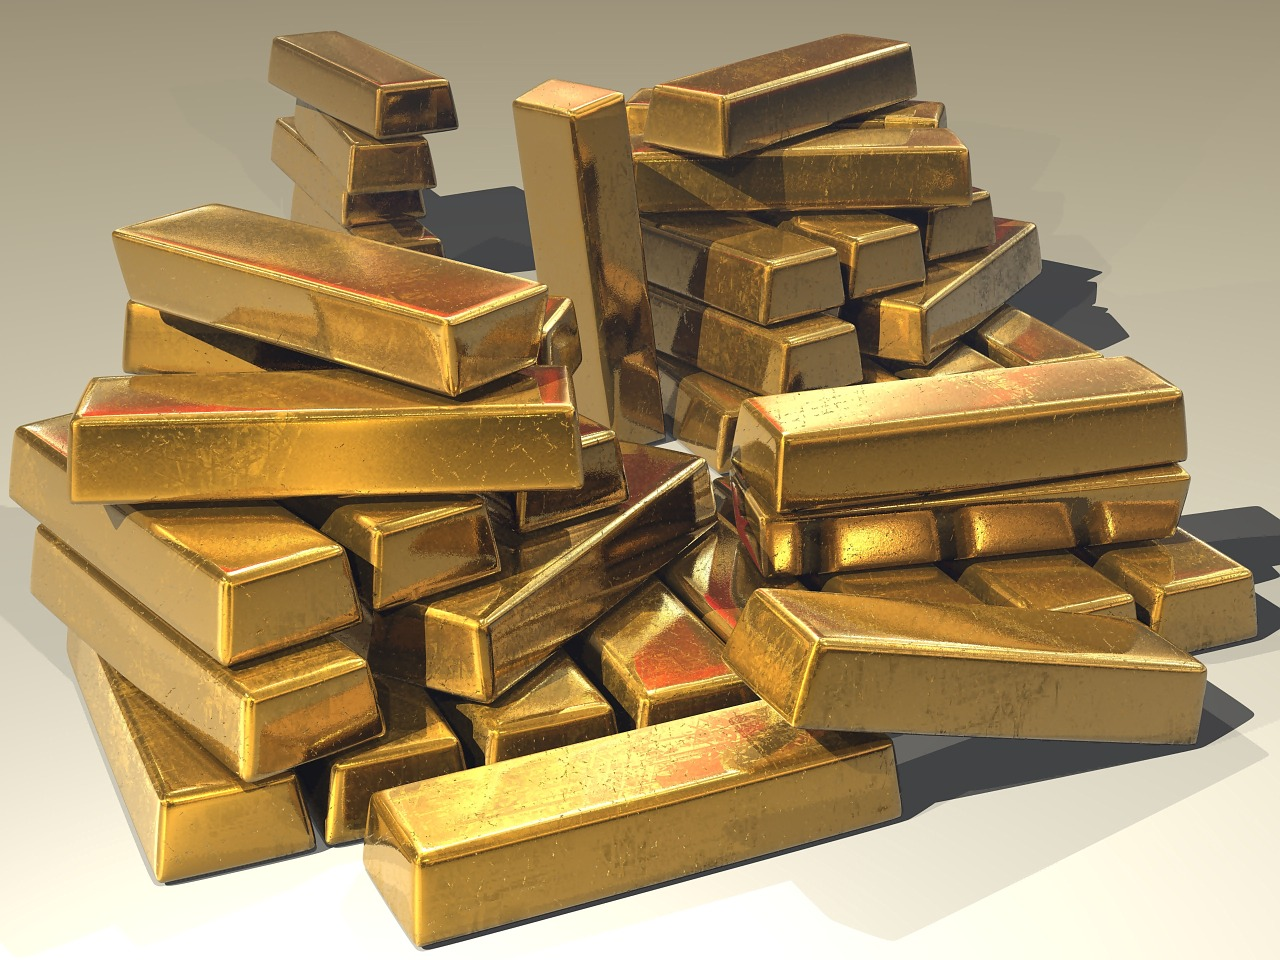 gold-513062_1280.jpg